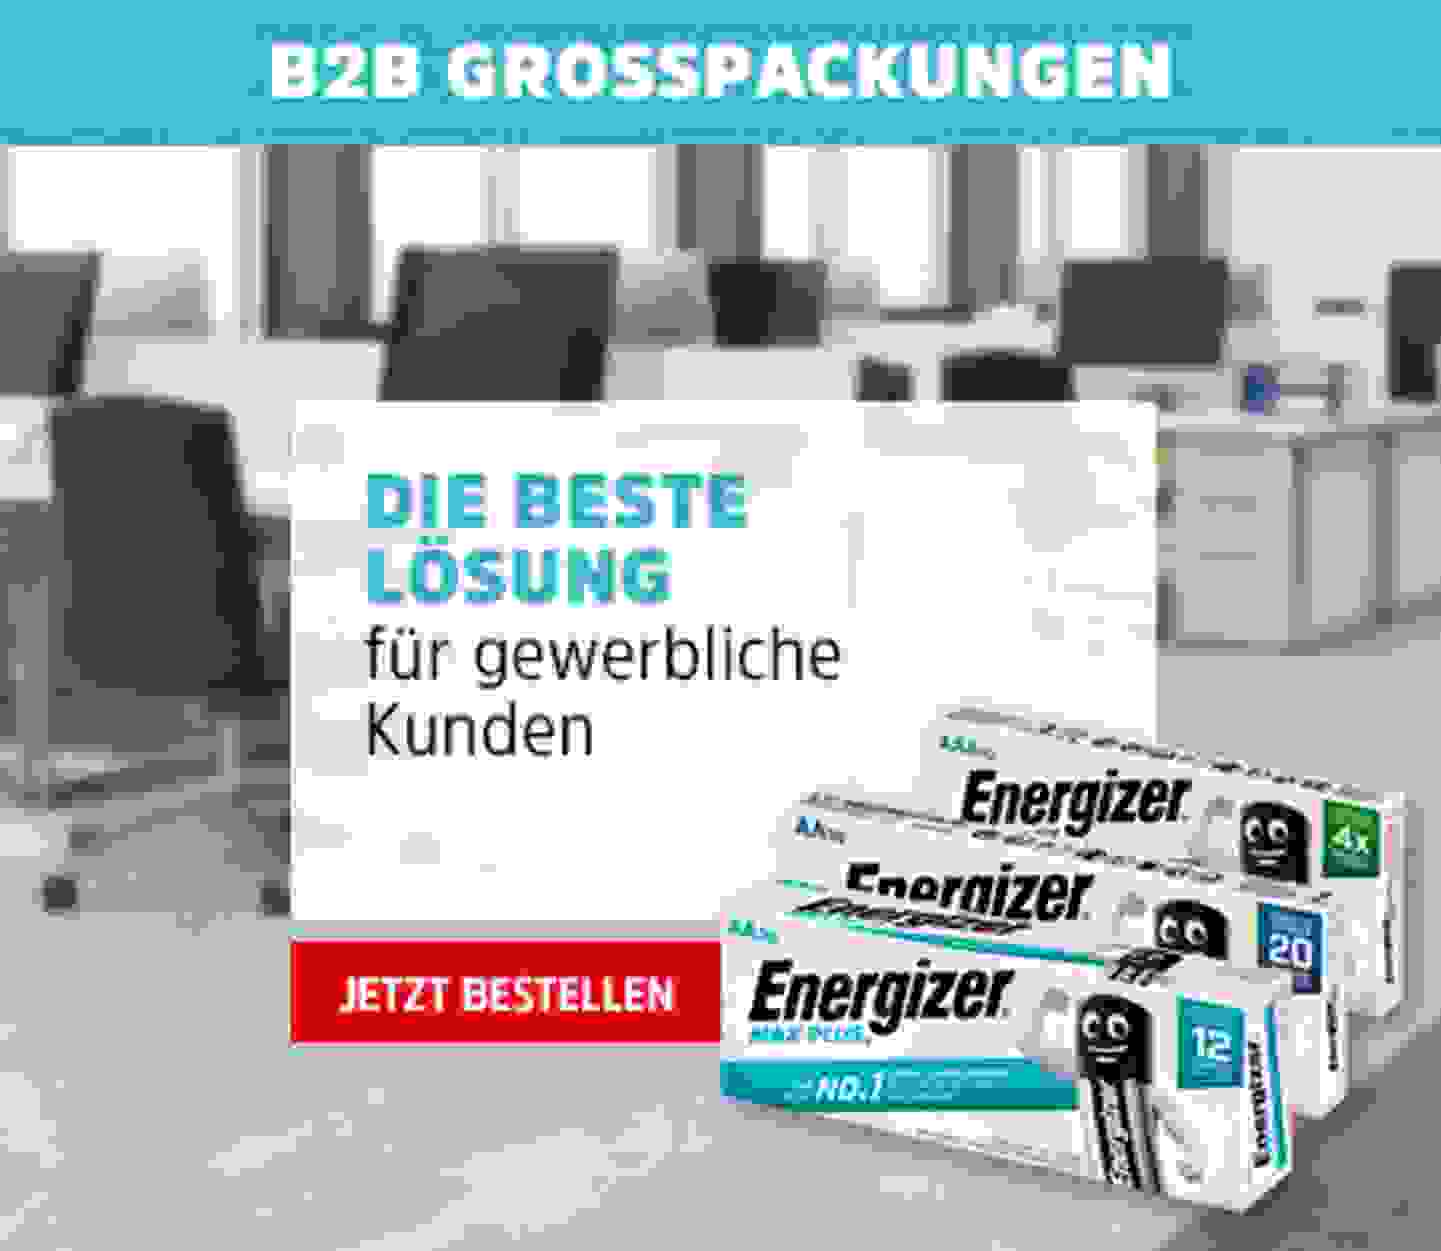 B2B Großpackungen